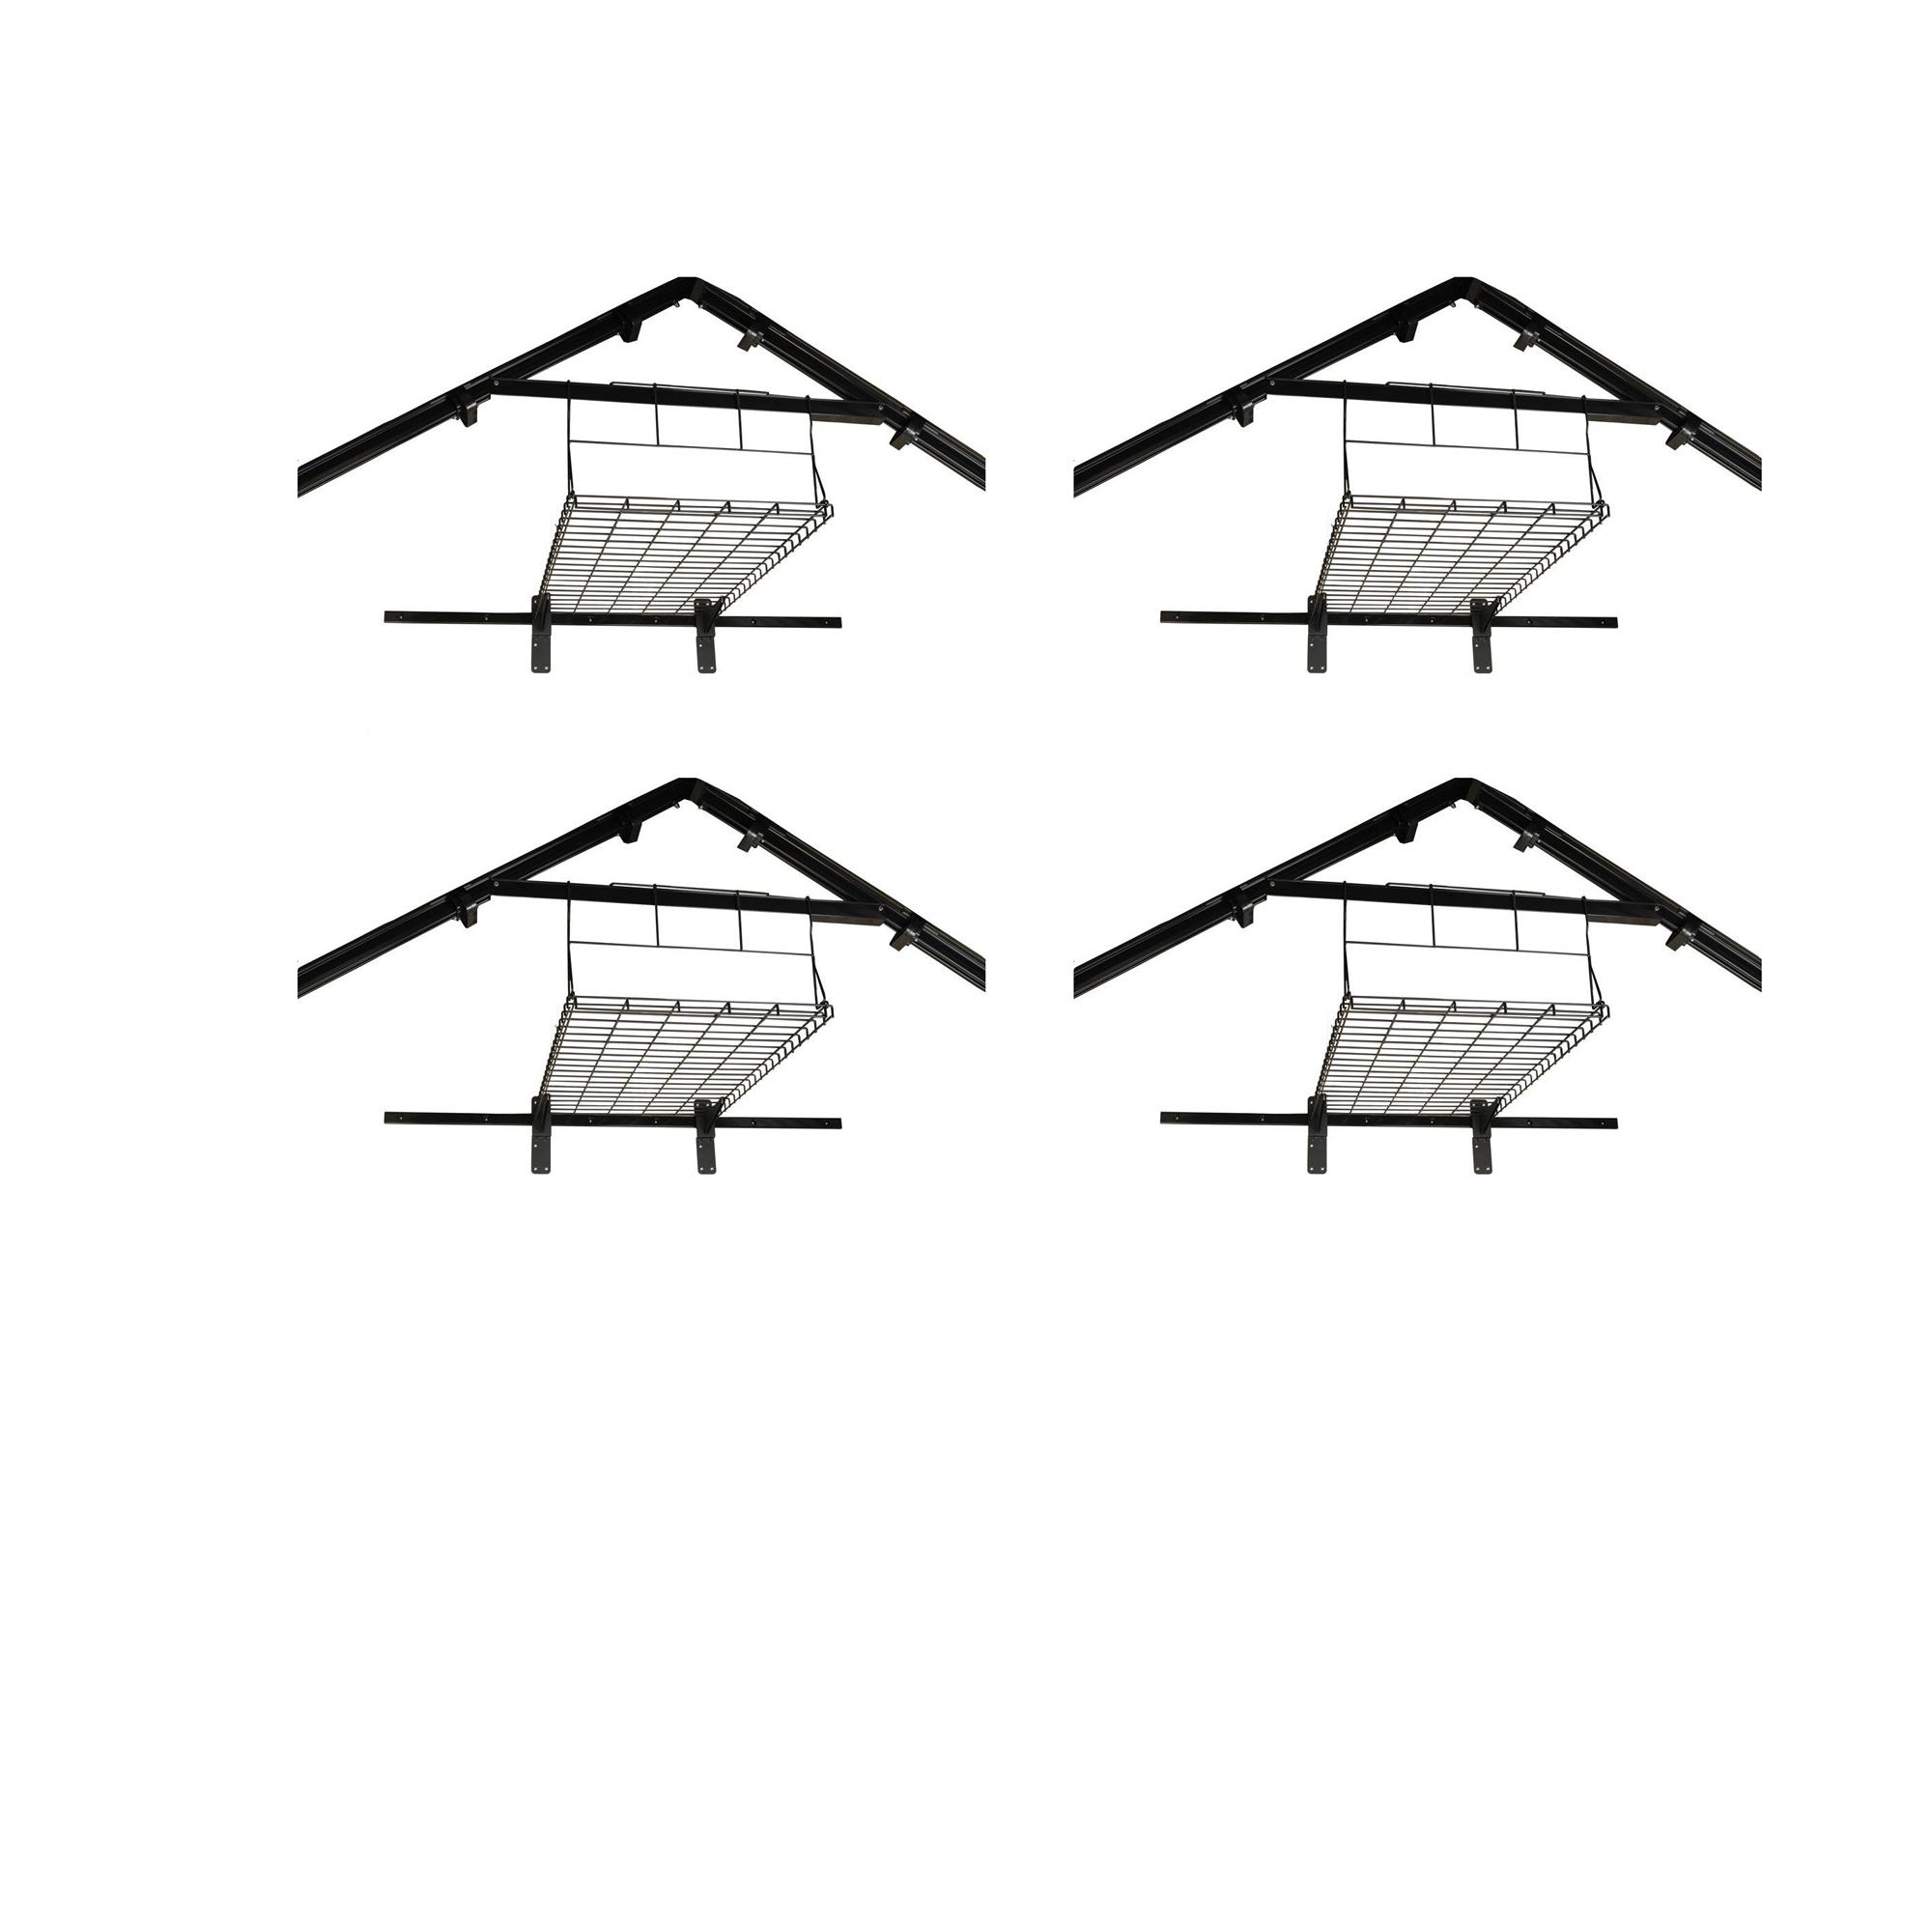 Suncast Outdoor Storage Shed Loft Shelf for Suncast Sheds (Shelf Only) (4 Pack)